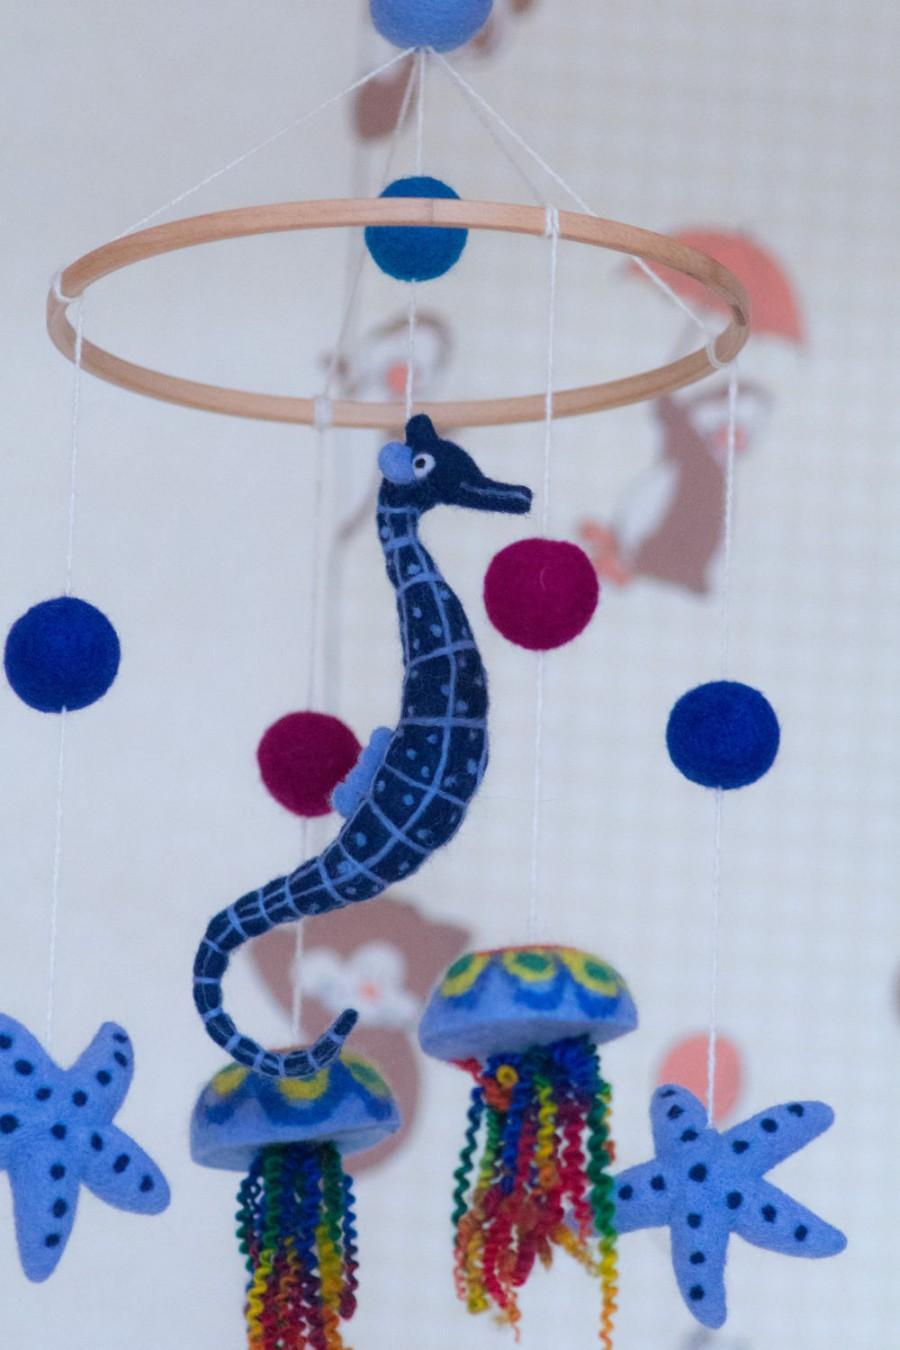 Wedding - Baby Mobile - Needle Felted sea horse jellyfish Mobile,Nursery Decor,Sea Crib Mobile,. modern nursery, cot mobile,crib mobile,hanging mobile